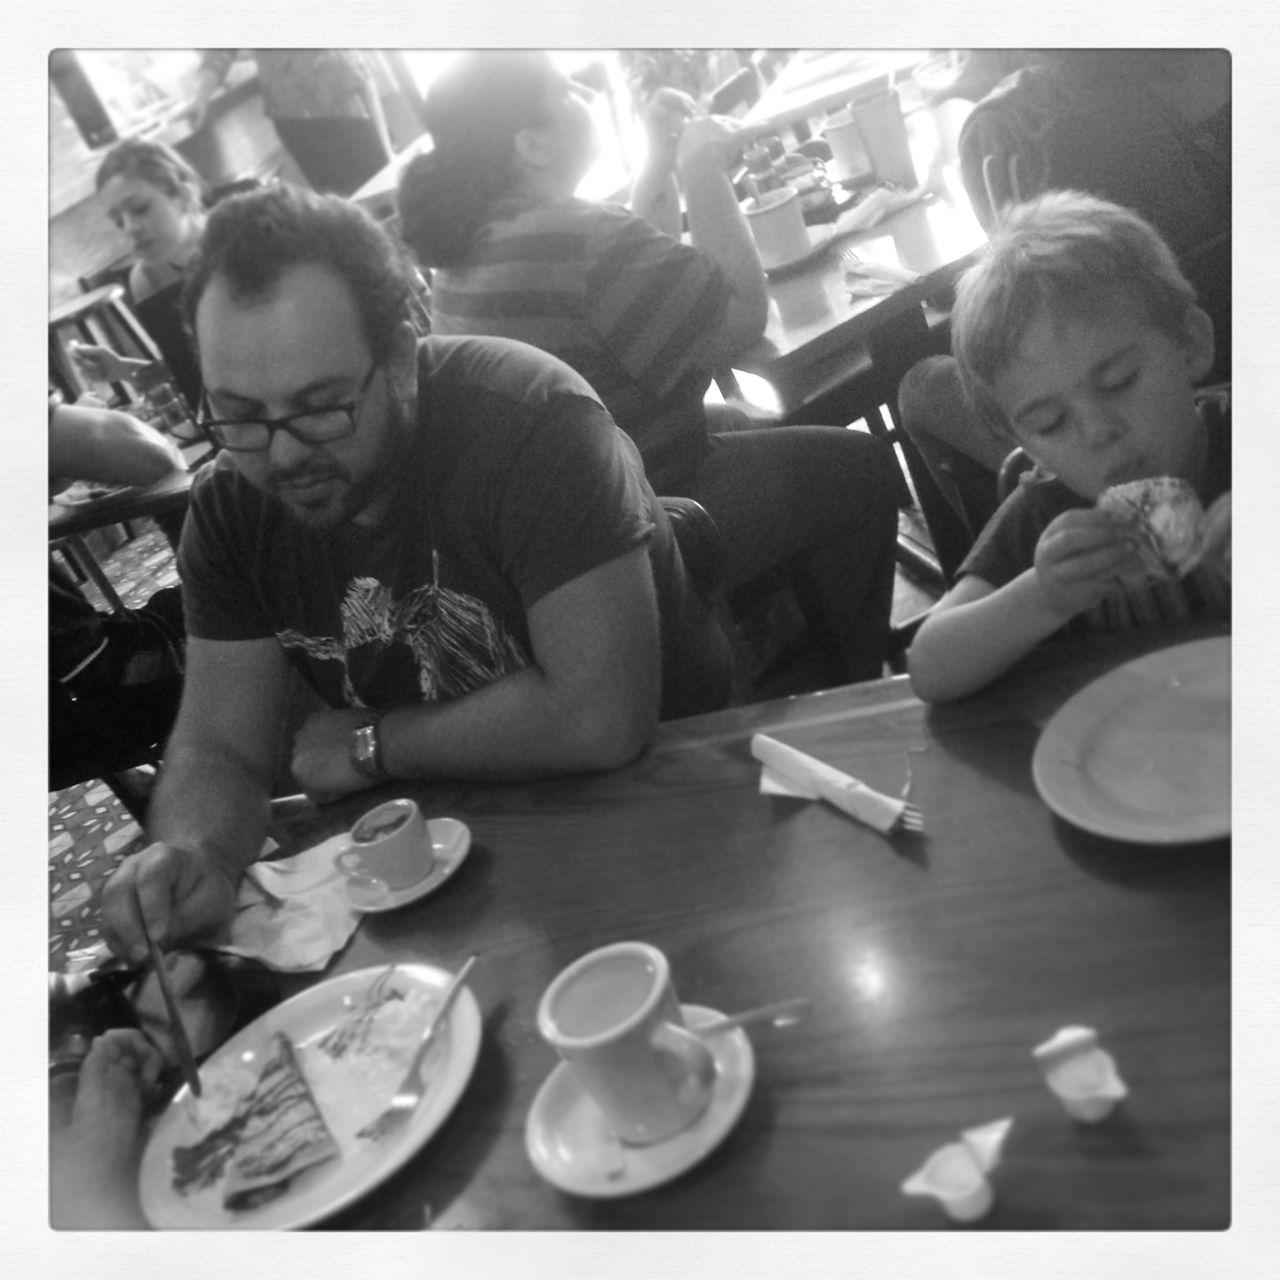 At the Greek restaurant in Ybor...